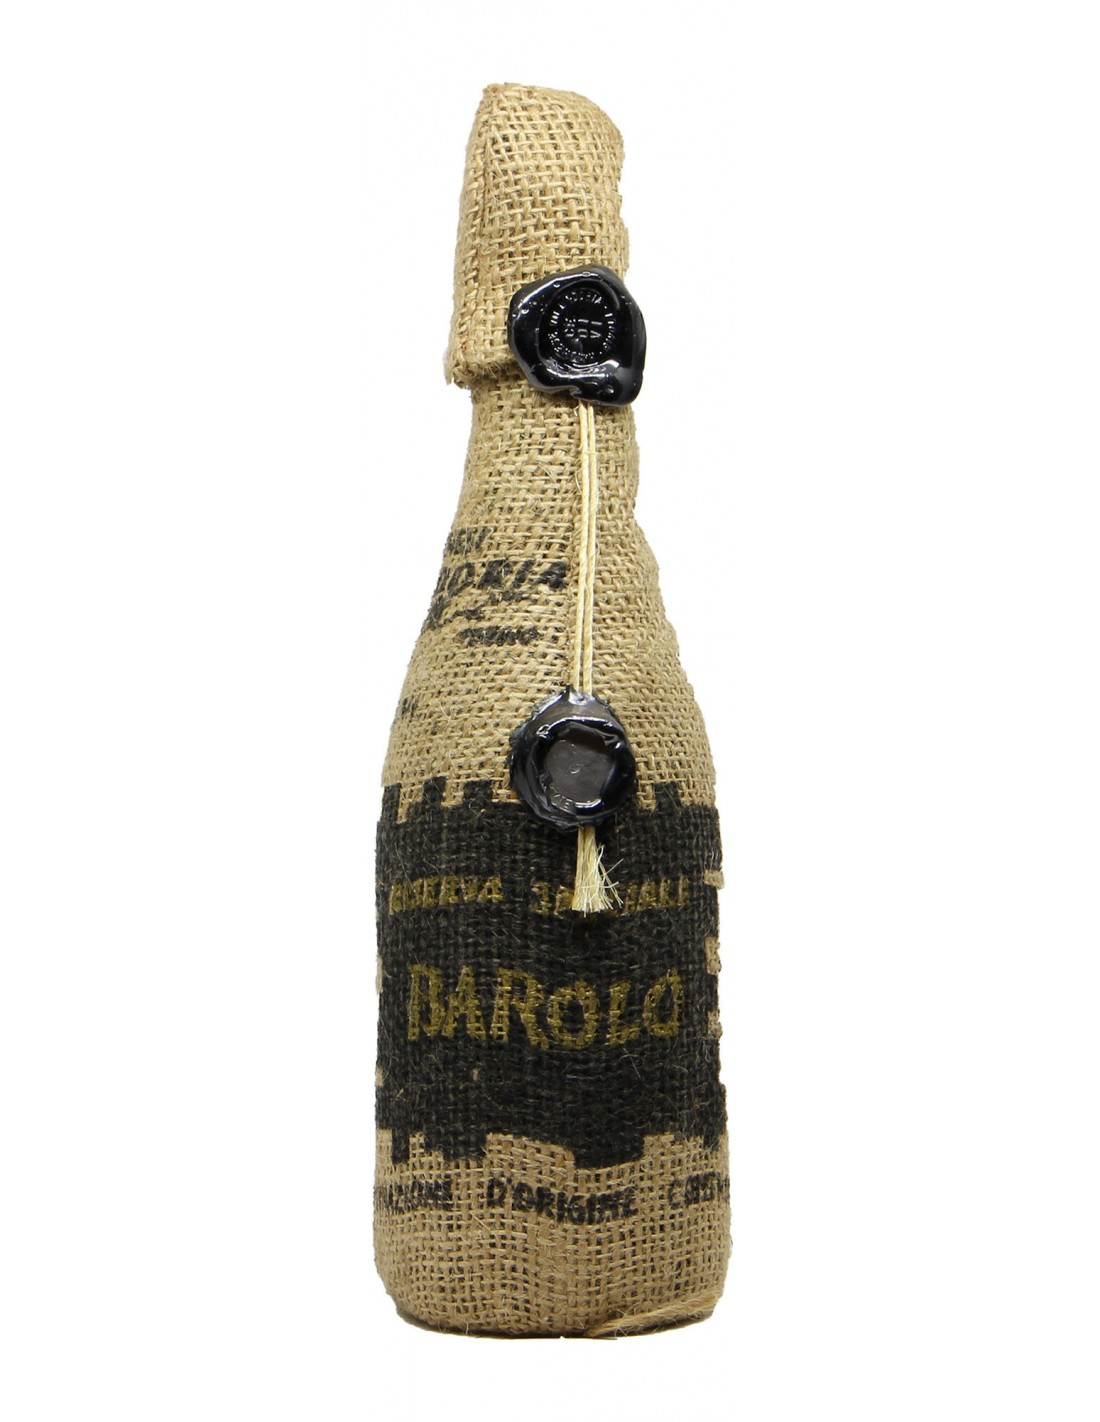 BARBARESCO RISERVA SPECIALE JUTA 1964 VILLADORIA Grandi Bottiglie